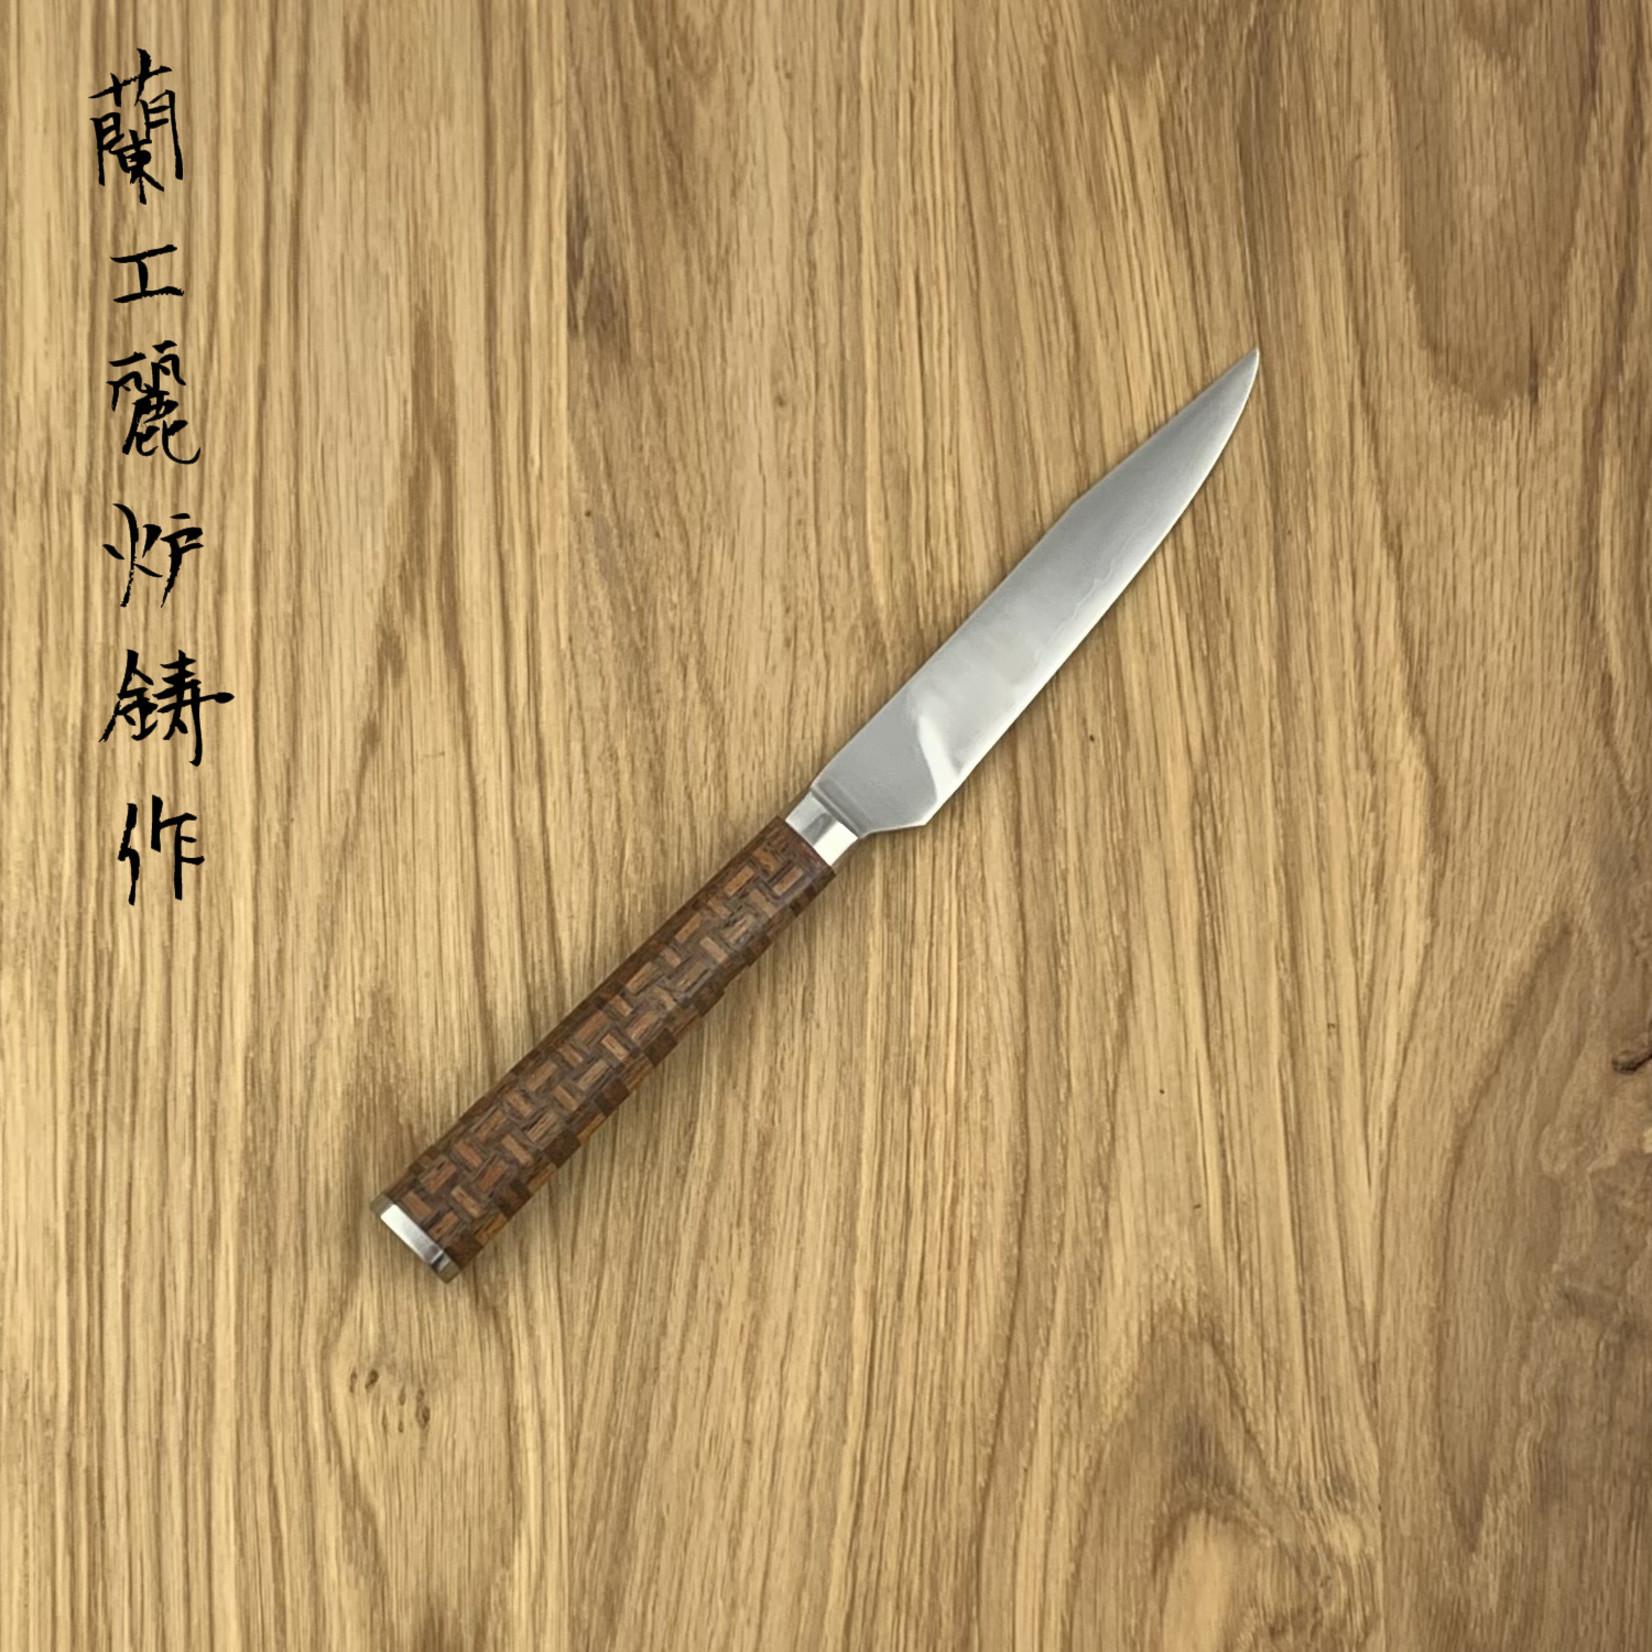 RYUSEN Steakknife SK06 Yosegi wooden floor